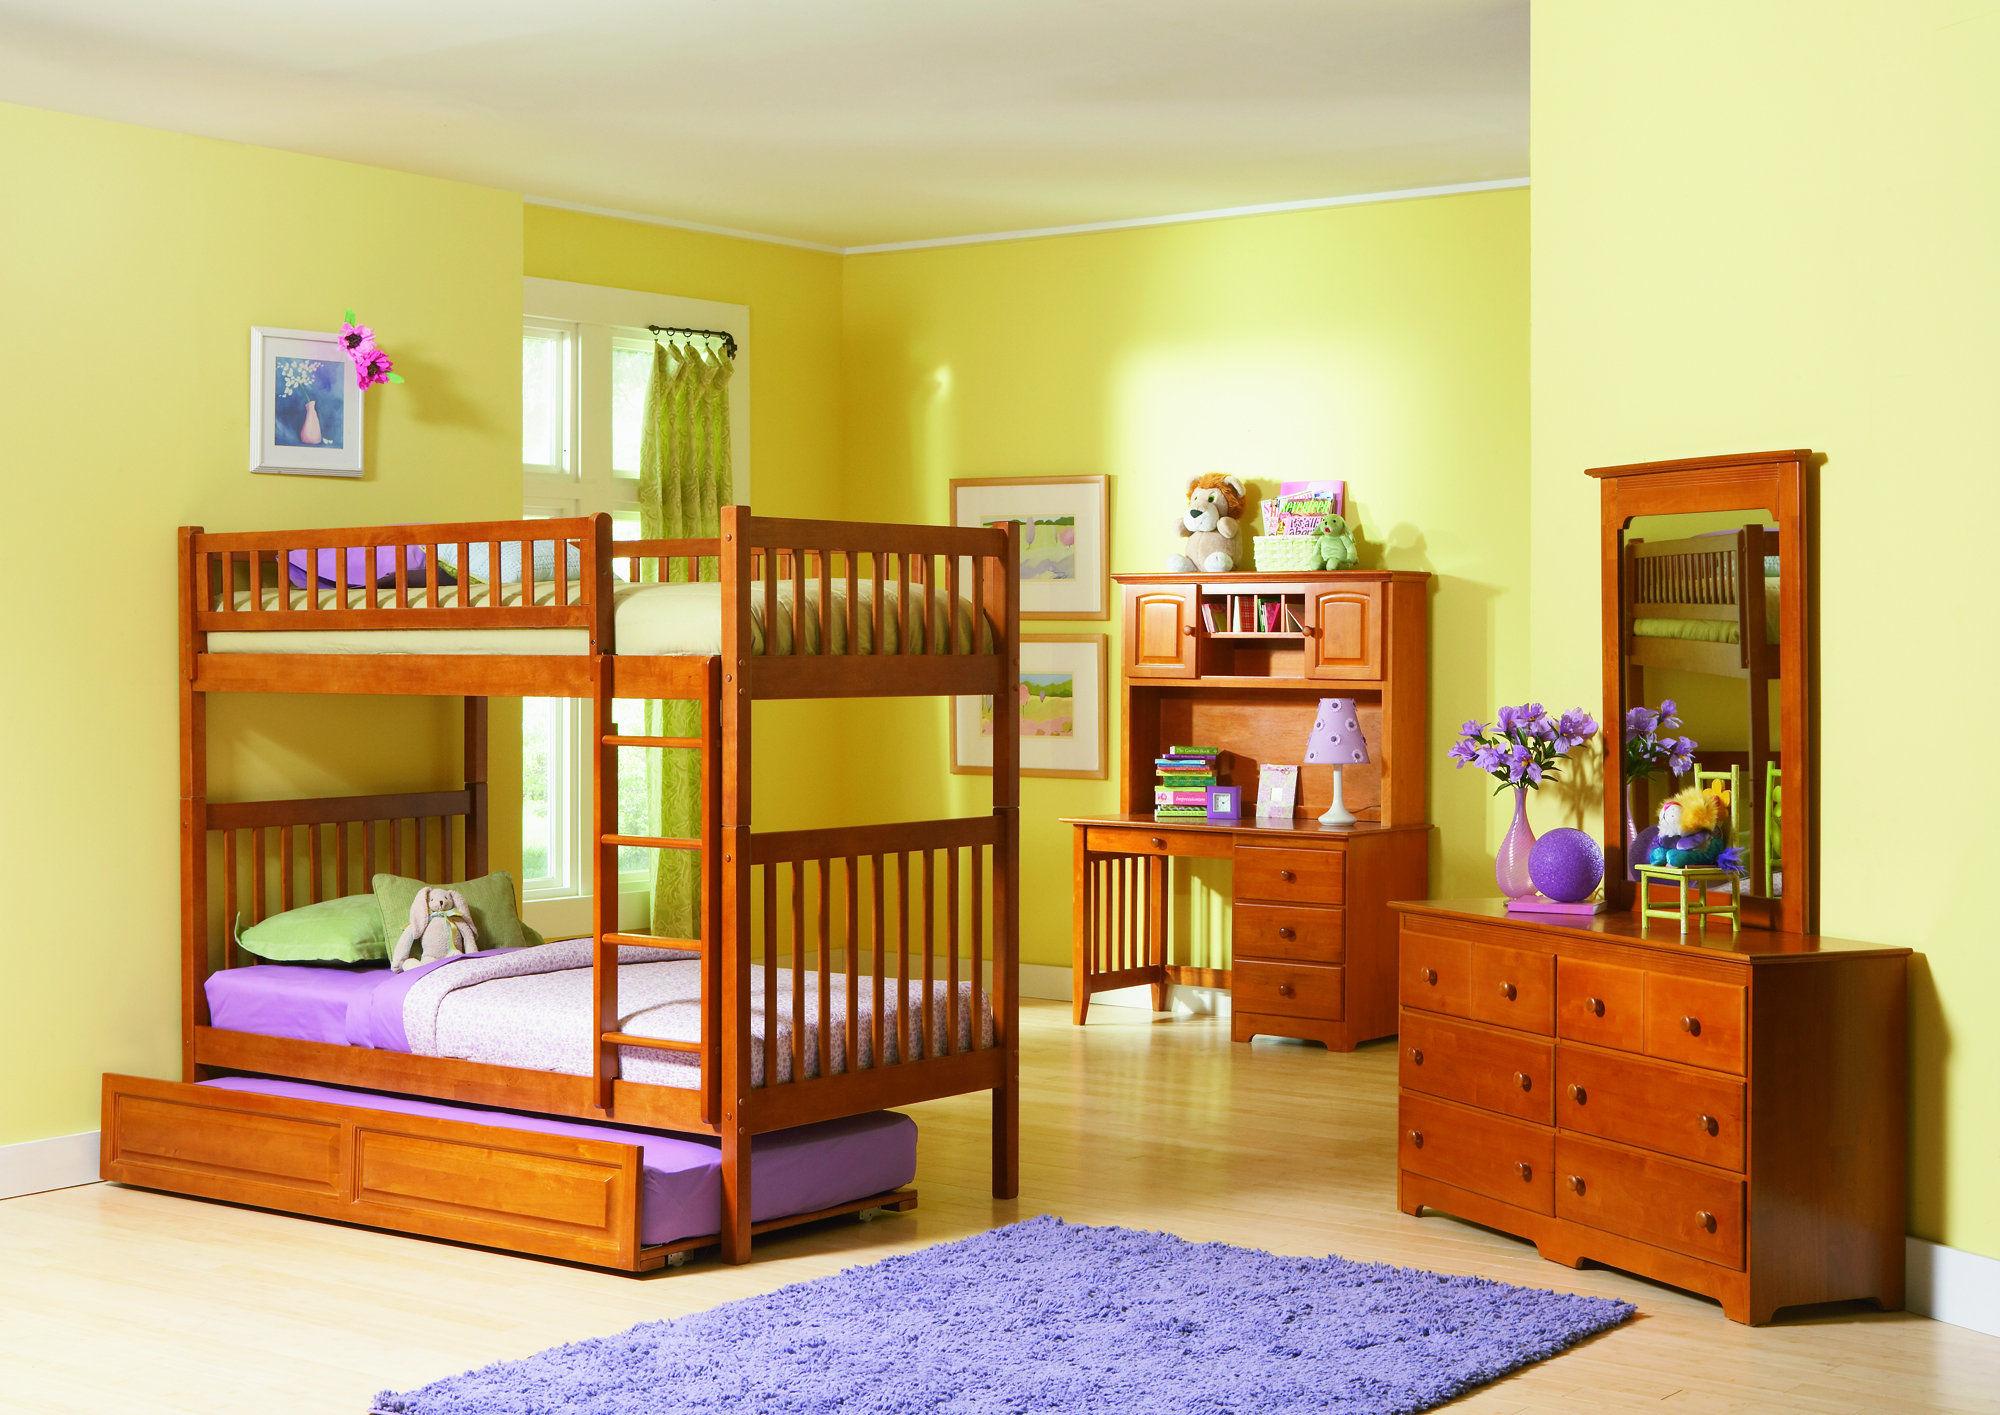 Childsroom What Your Childu0027s Bedroom ...